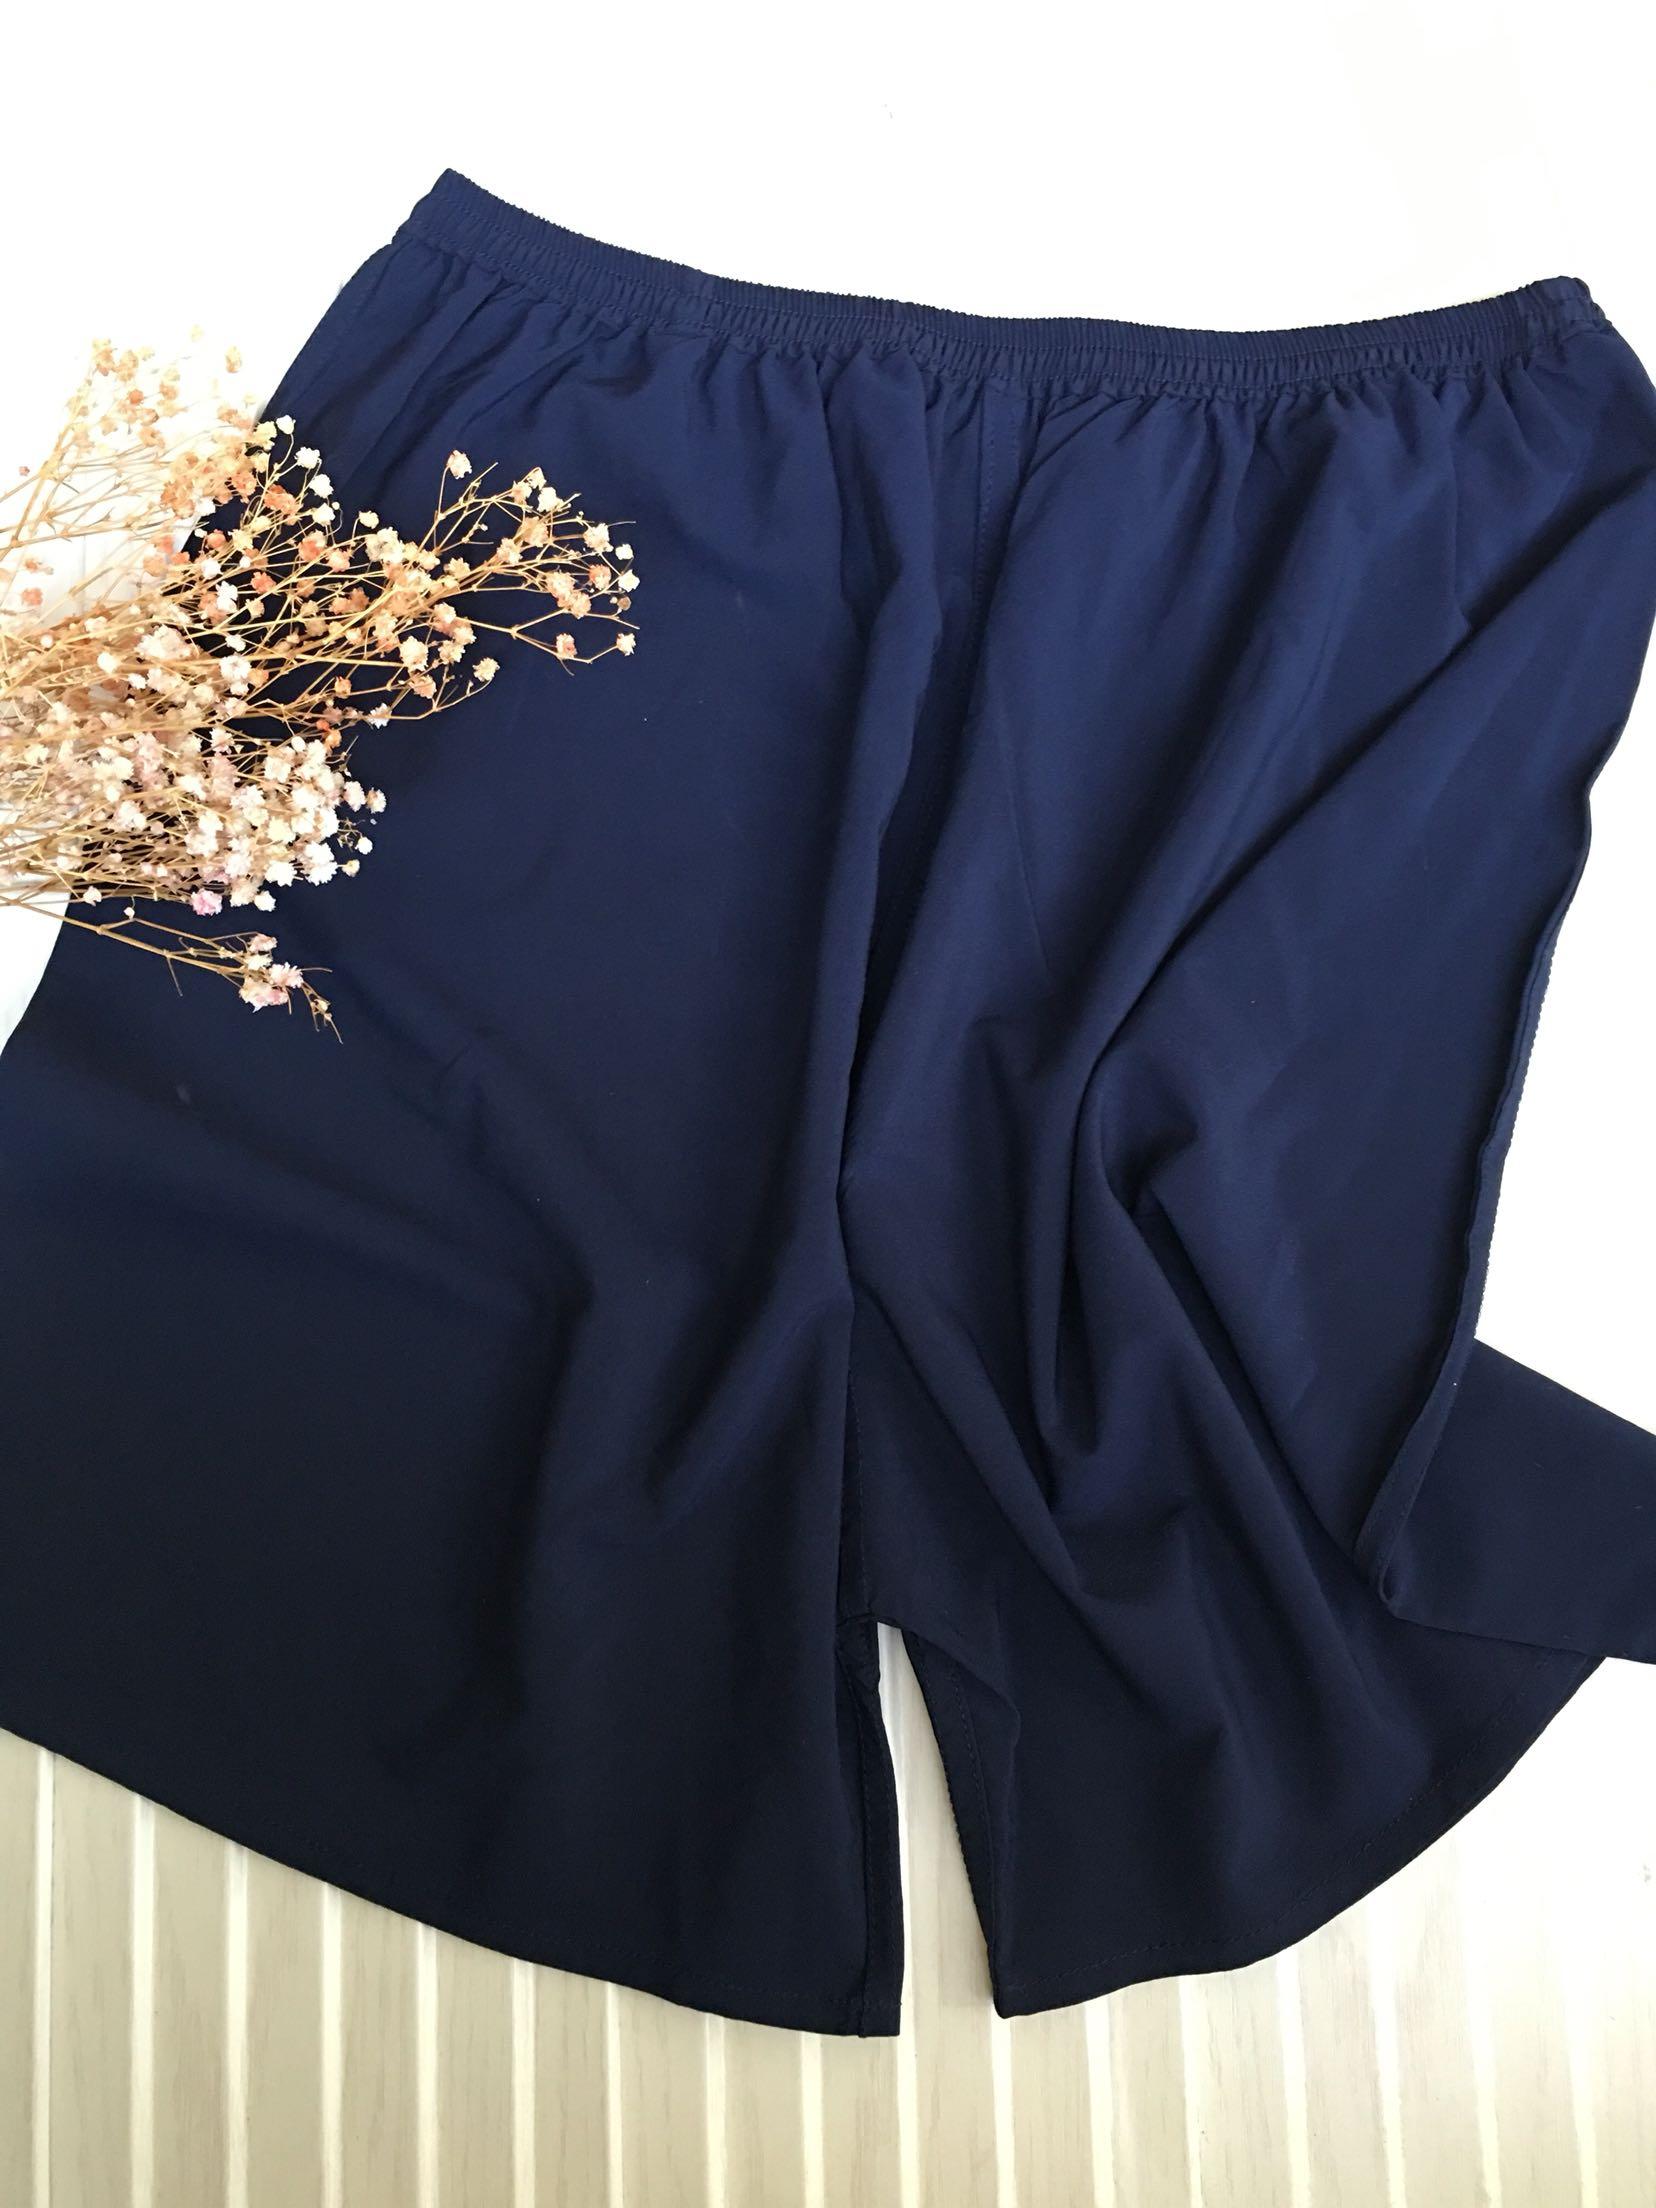 Mulberry silk mens Home Shorts / beach pants crepe de Chine good material dark blue